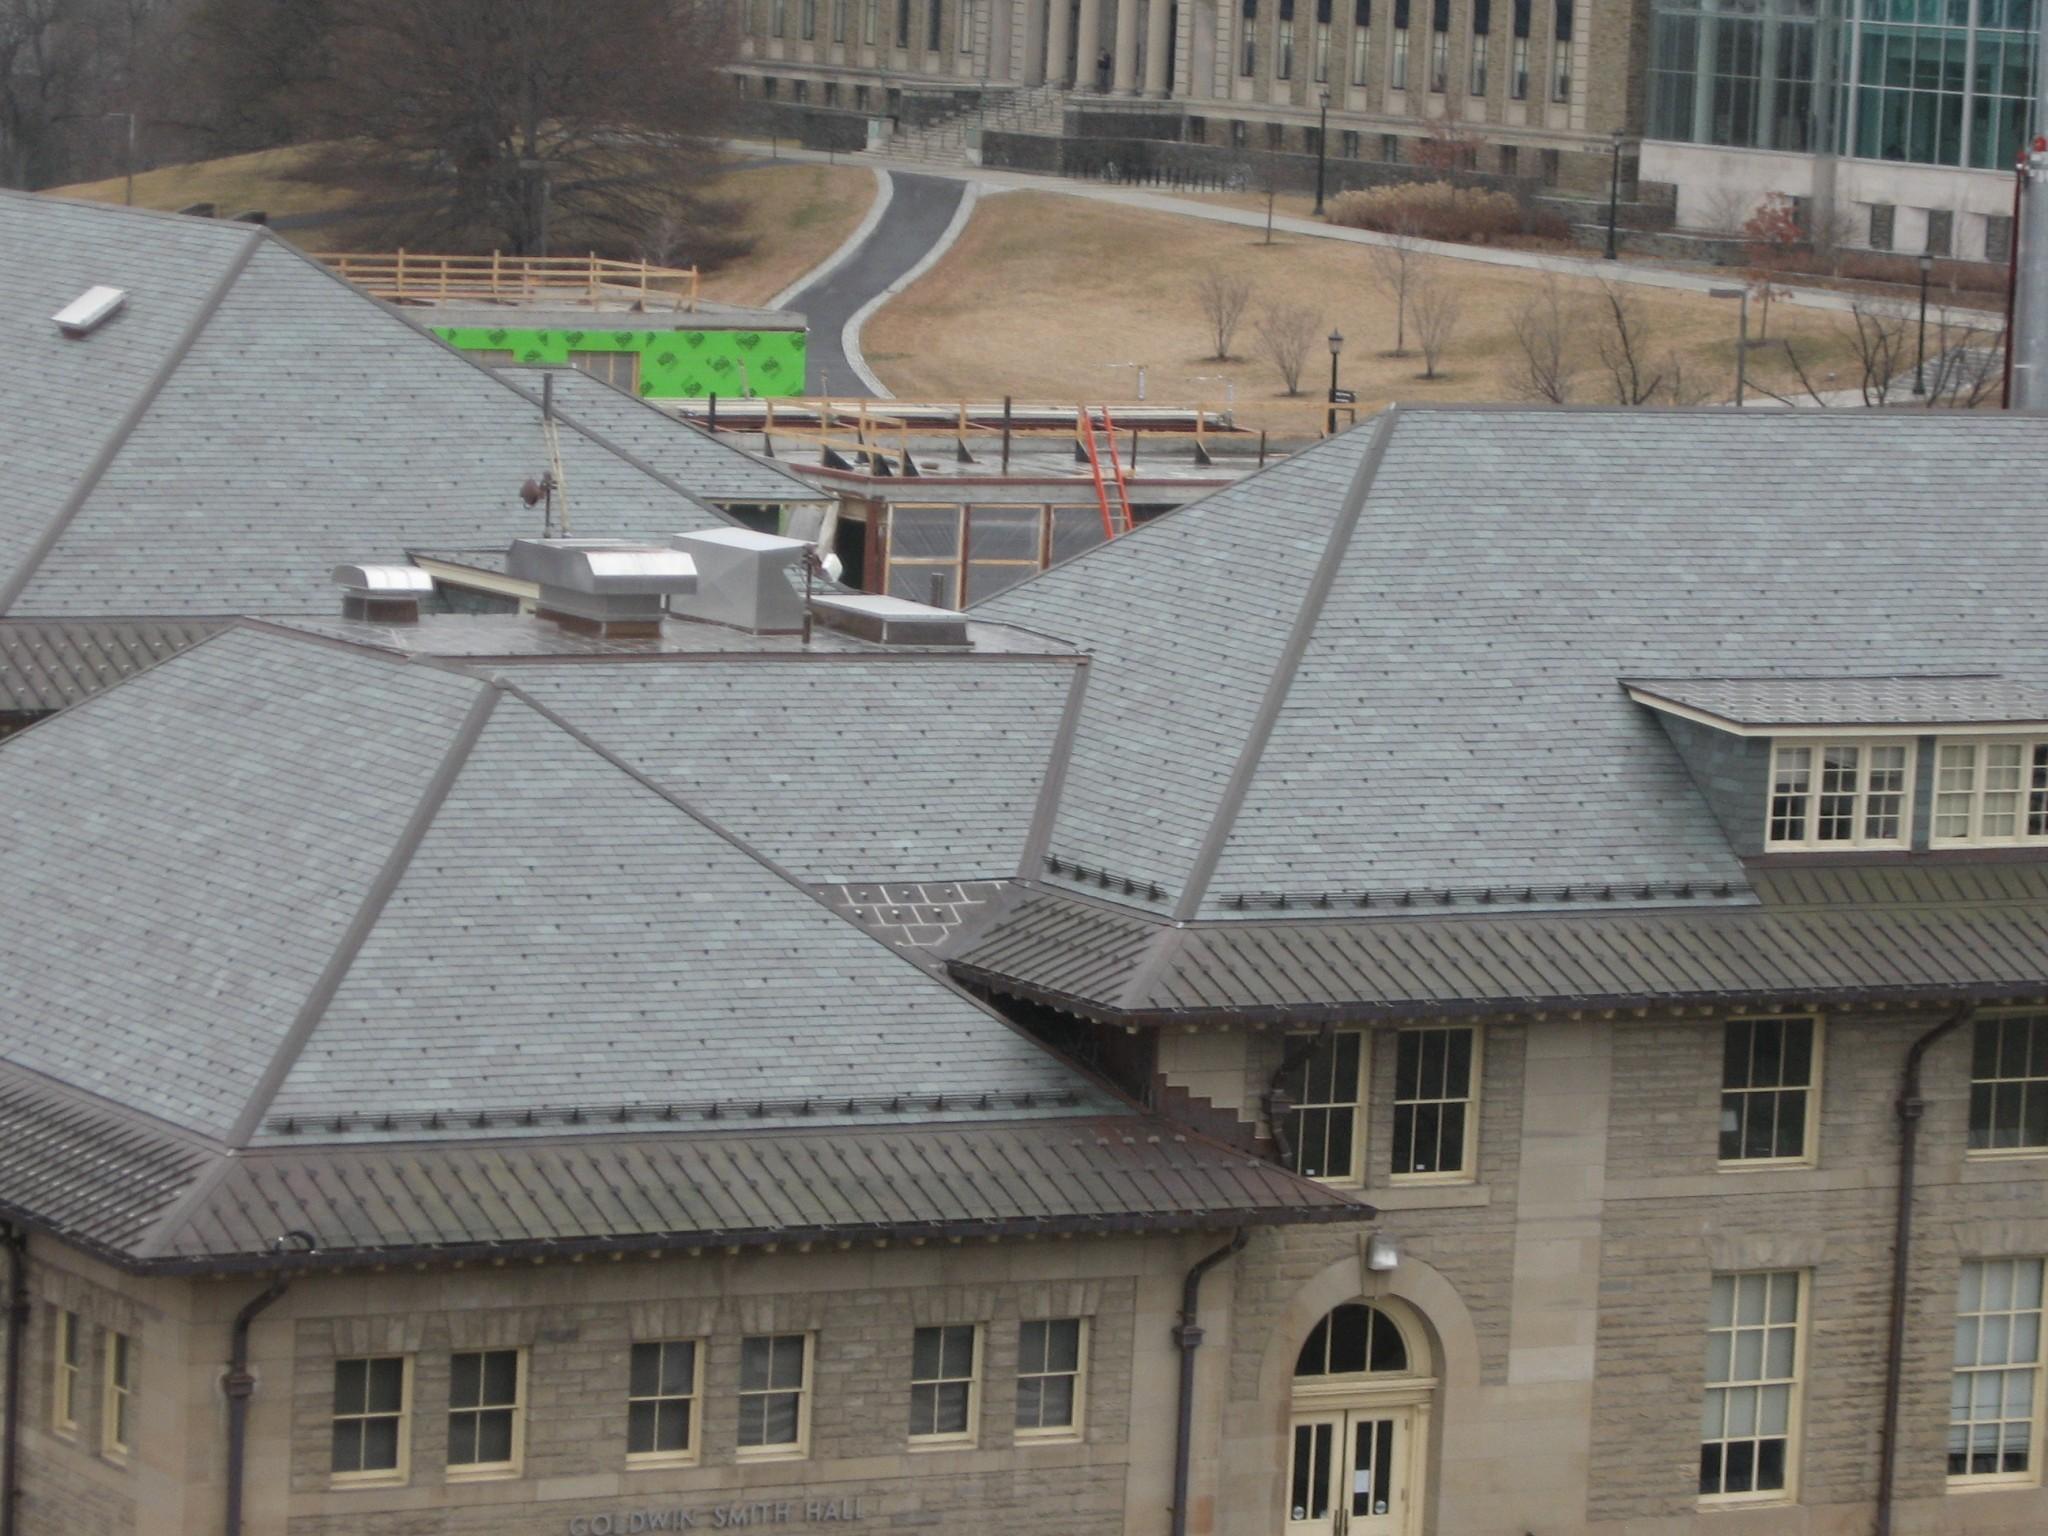 Cornell University Goldwin Smith Hall Evans Roofing